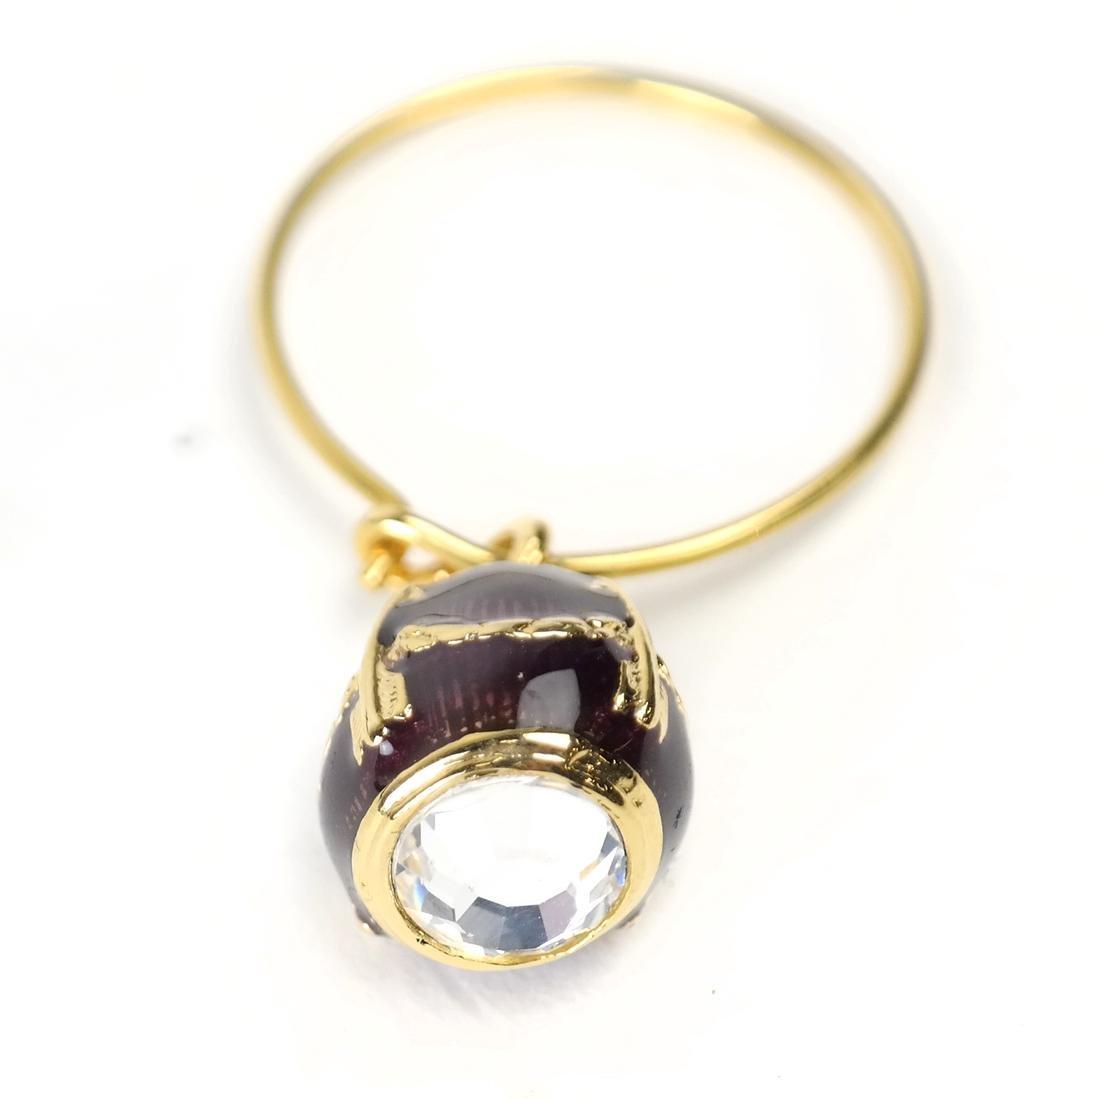 Six Wine Glass Charms, Fabergé - 4